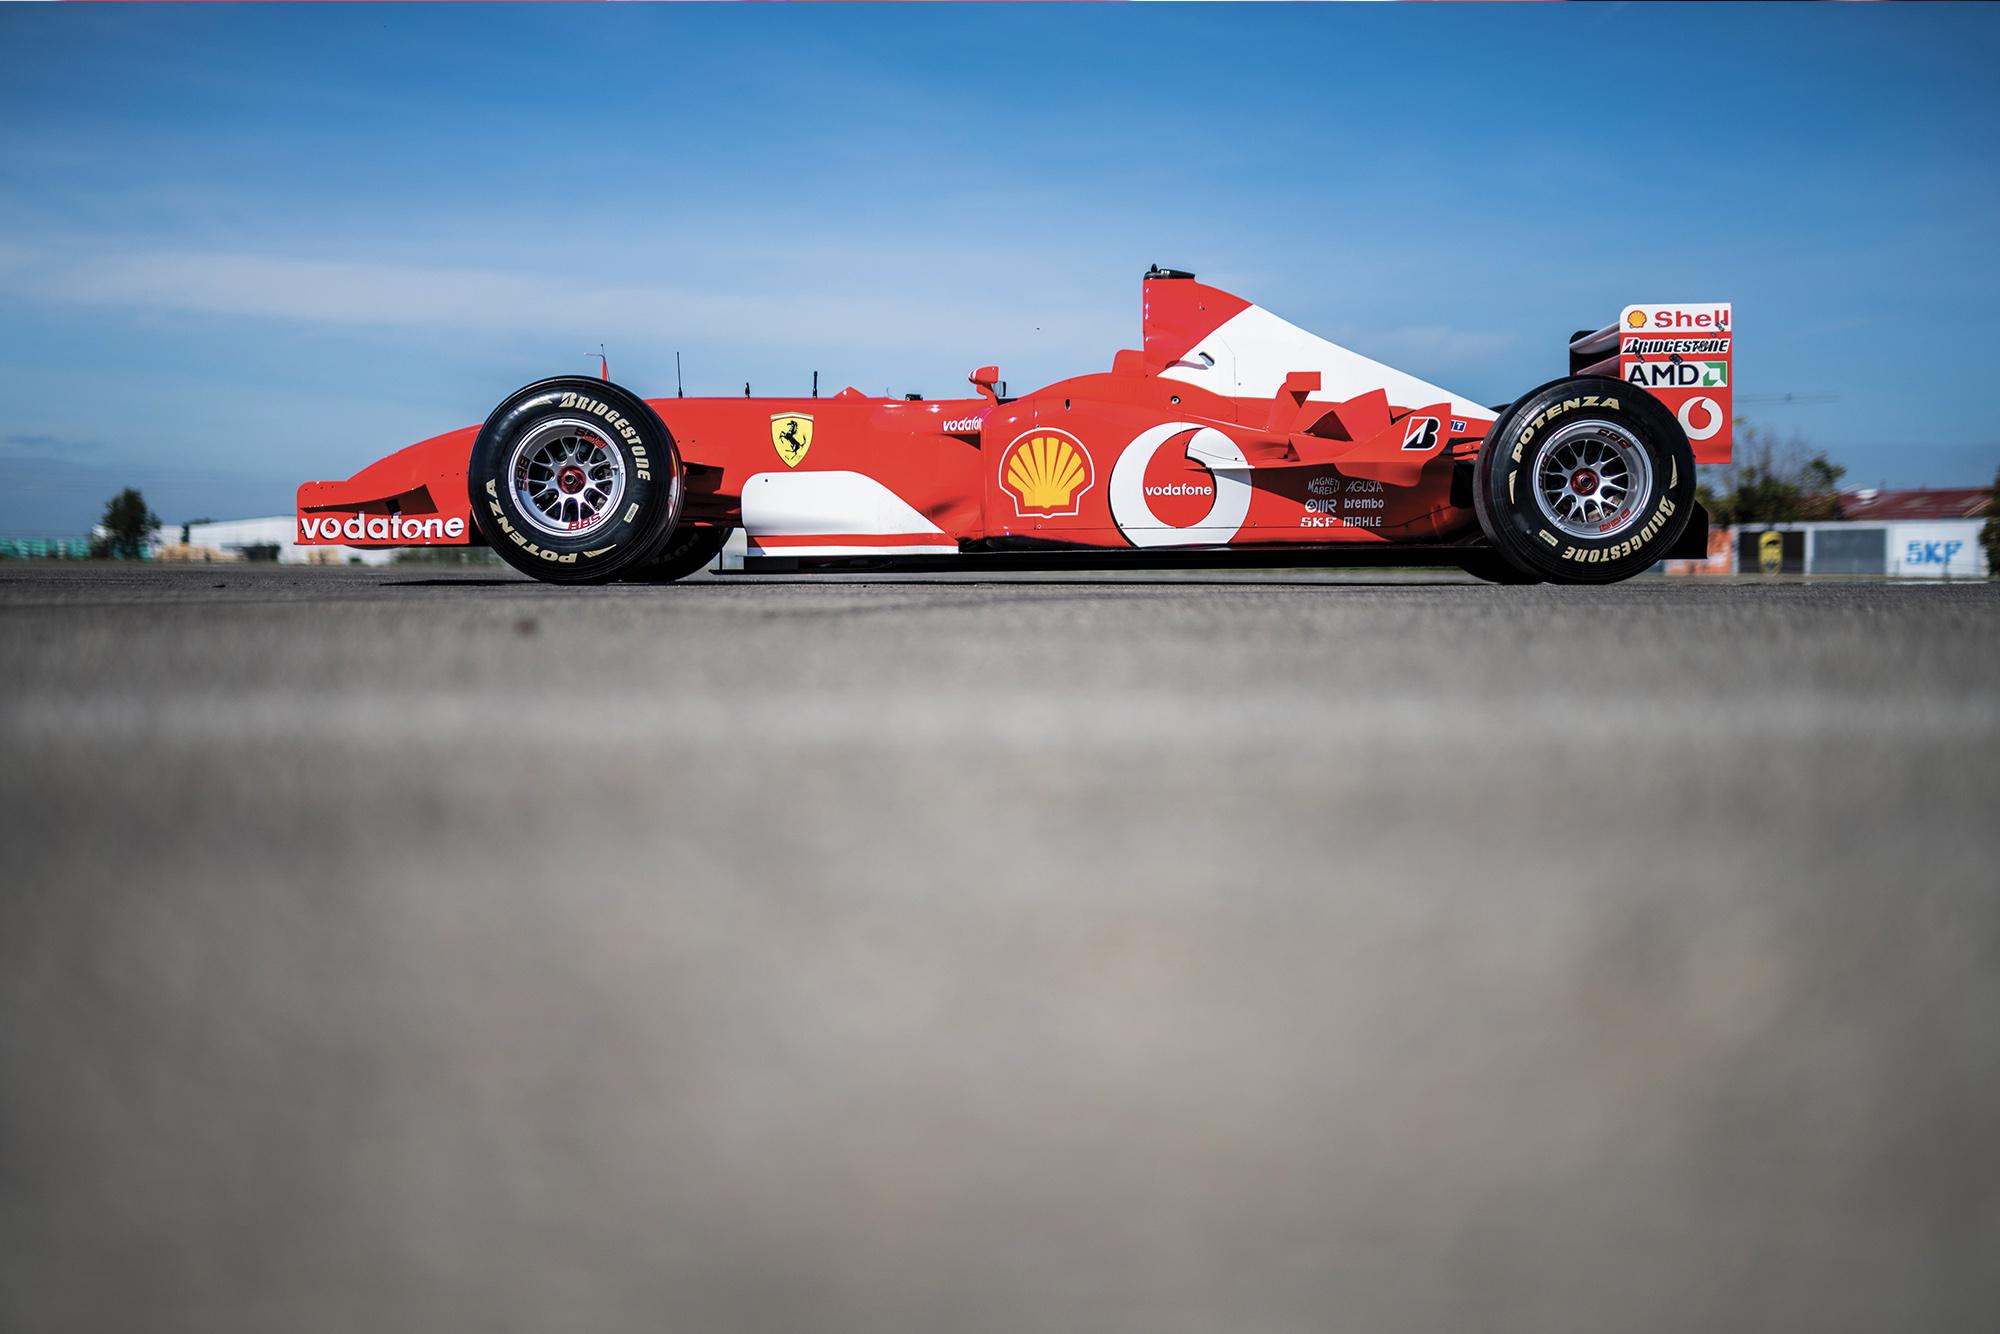 Michael Schumacher's Ferrari F2002 for auction side view